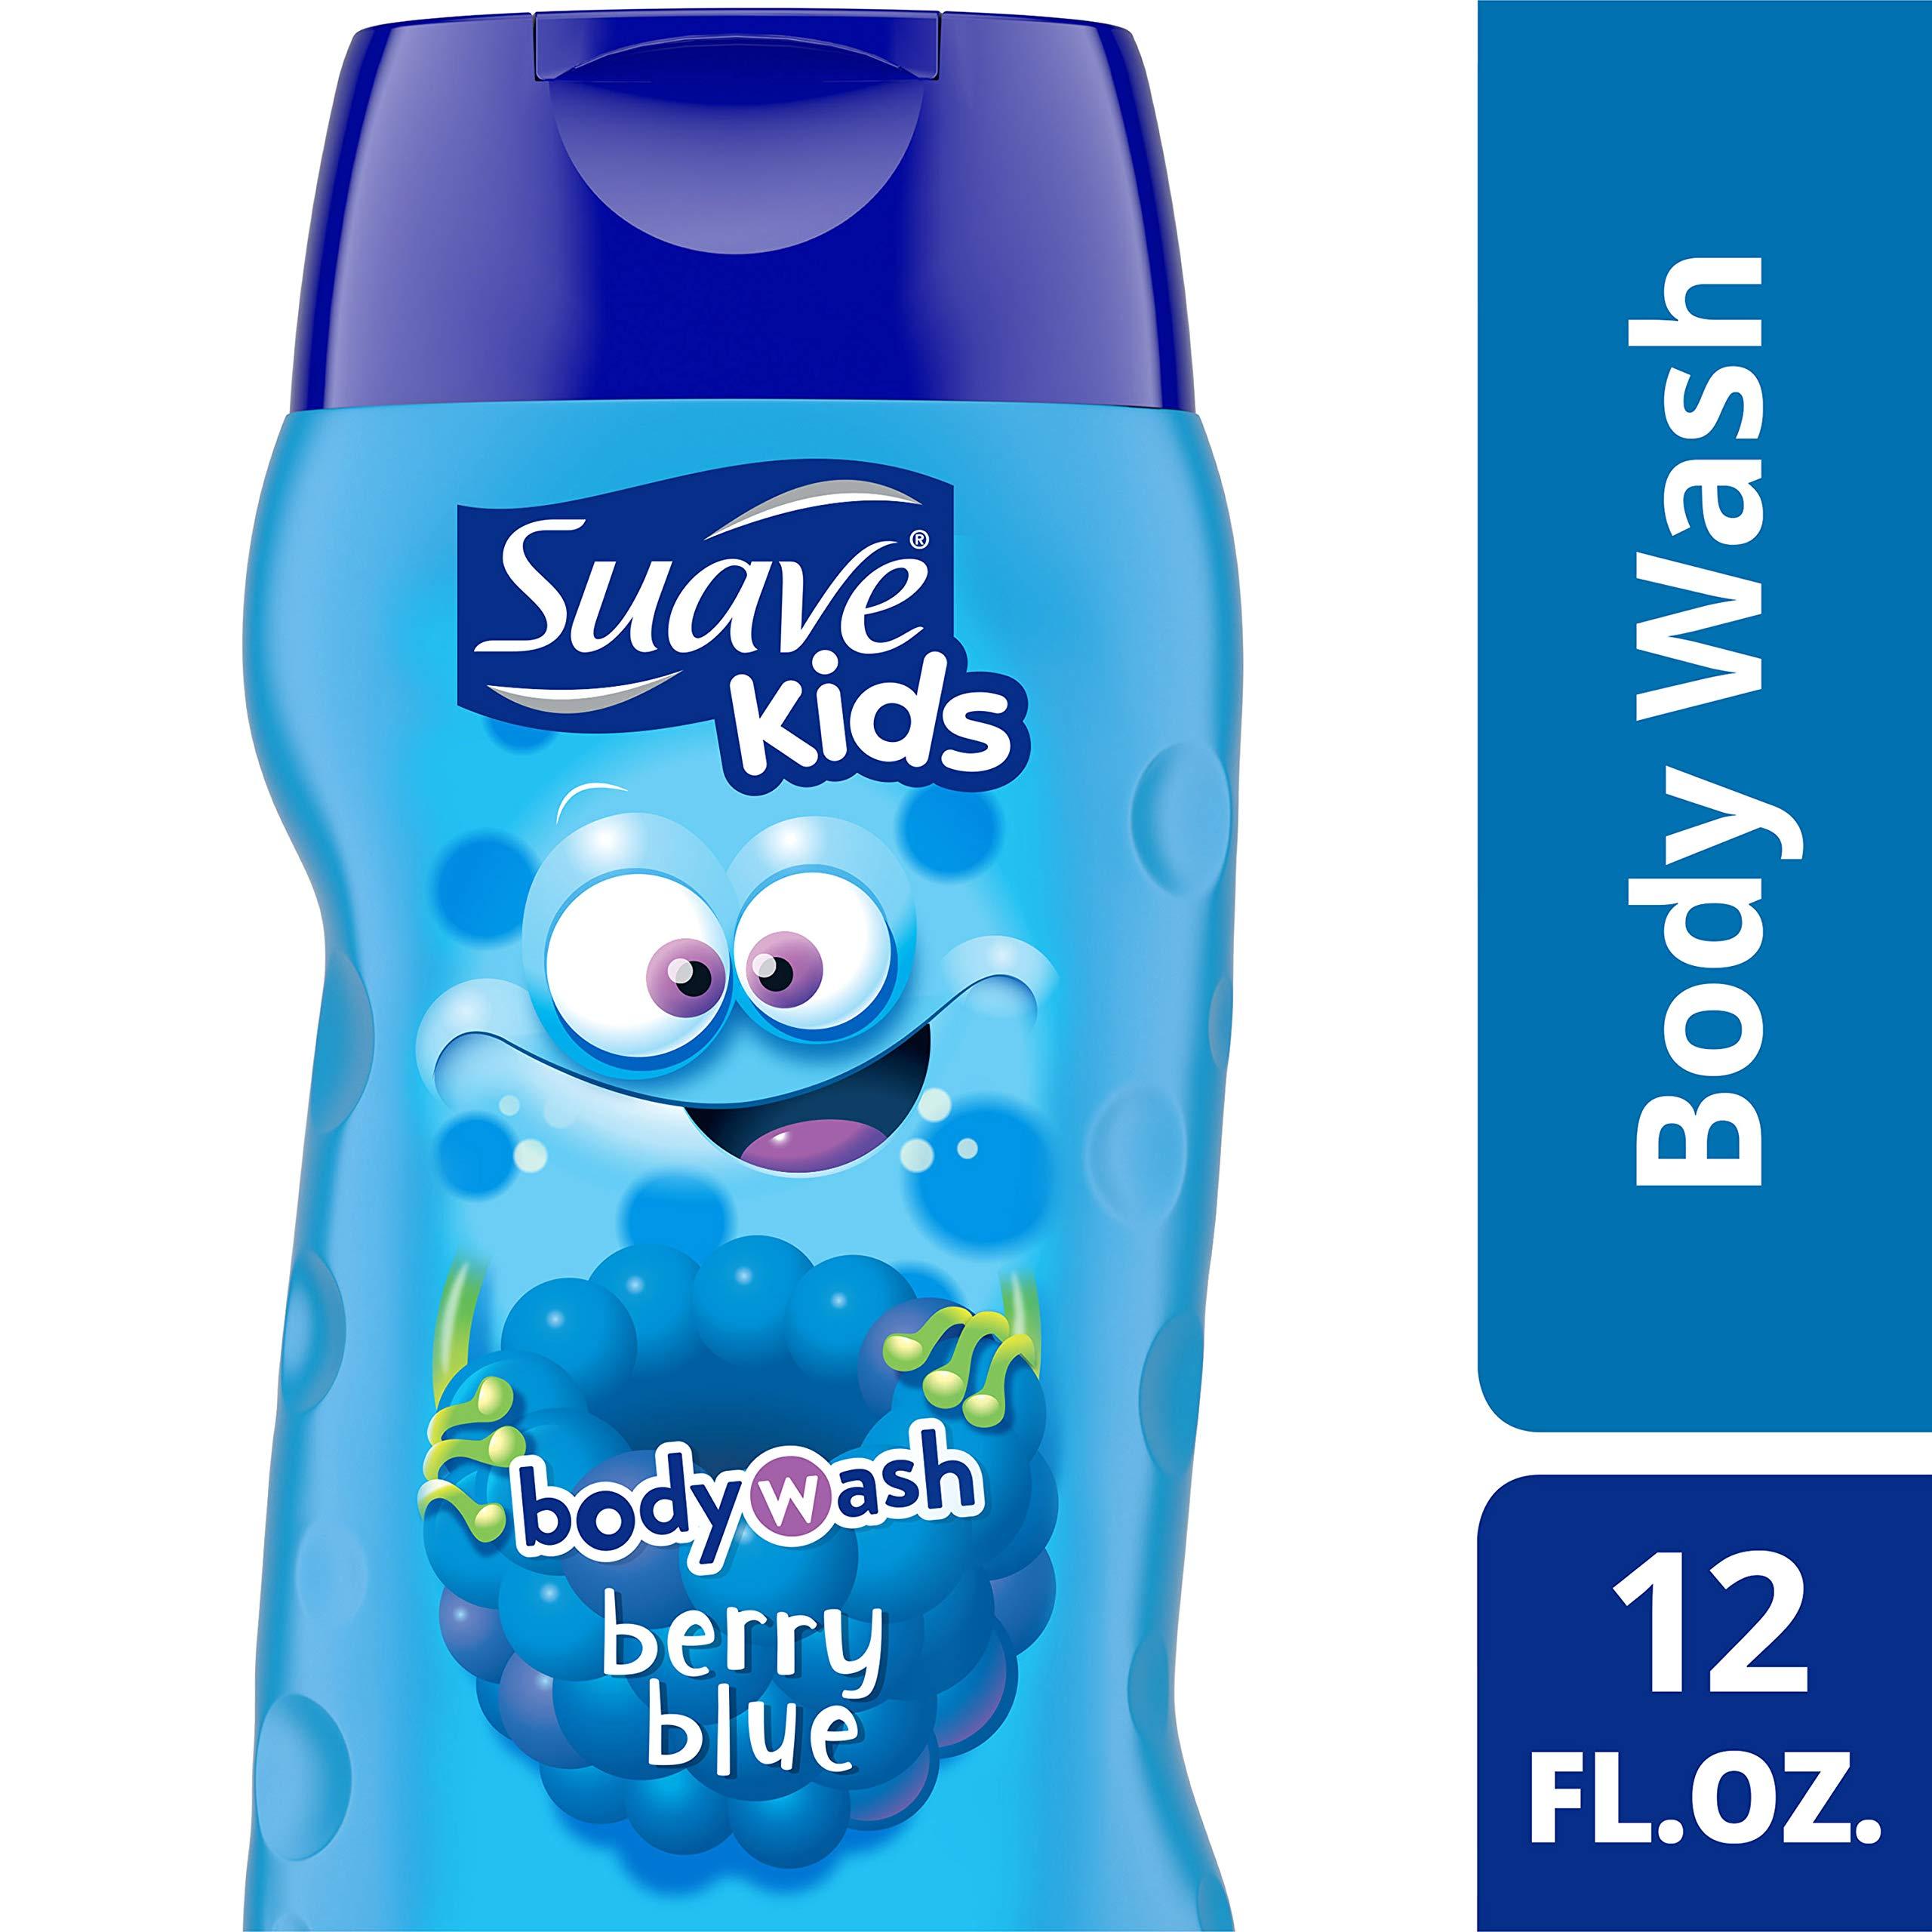 Suave Tear Free Berry Blue Body Wash 12 oz ,